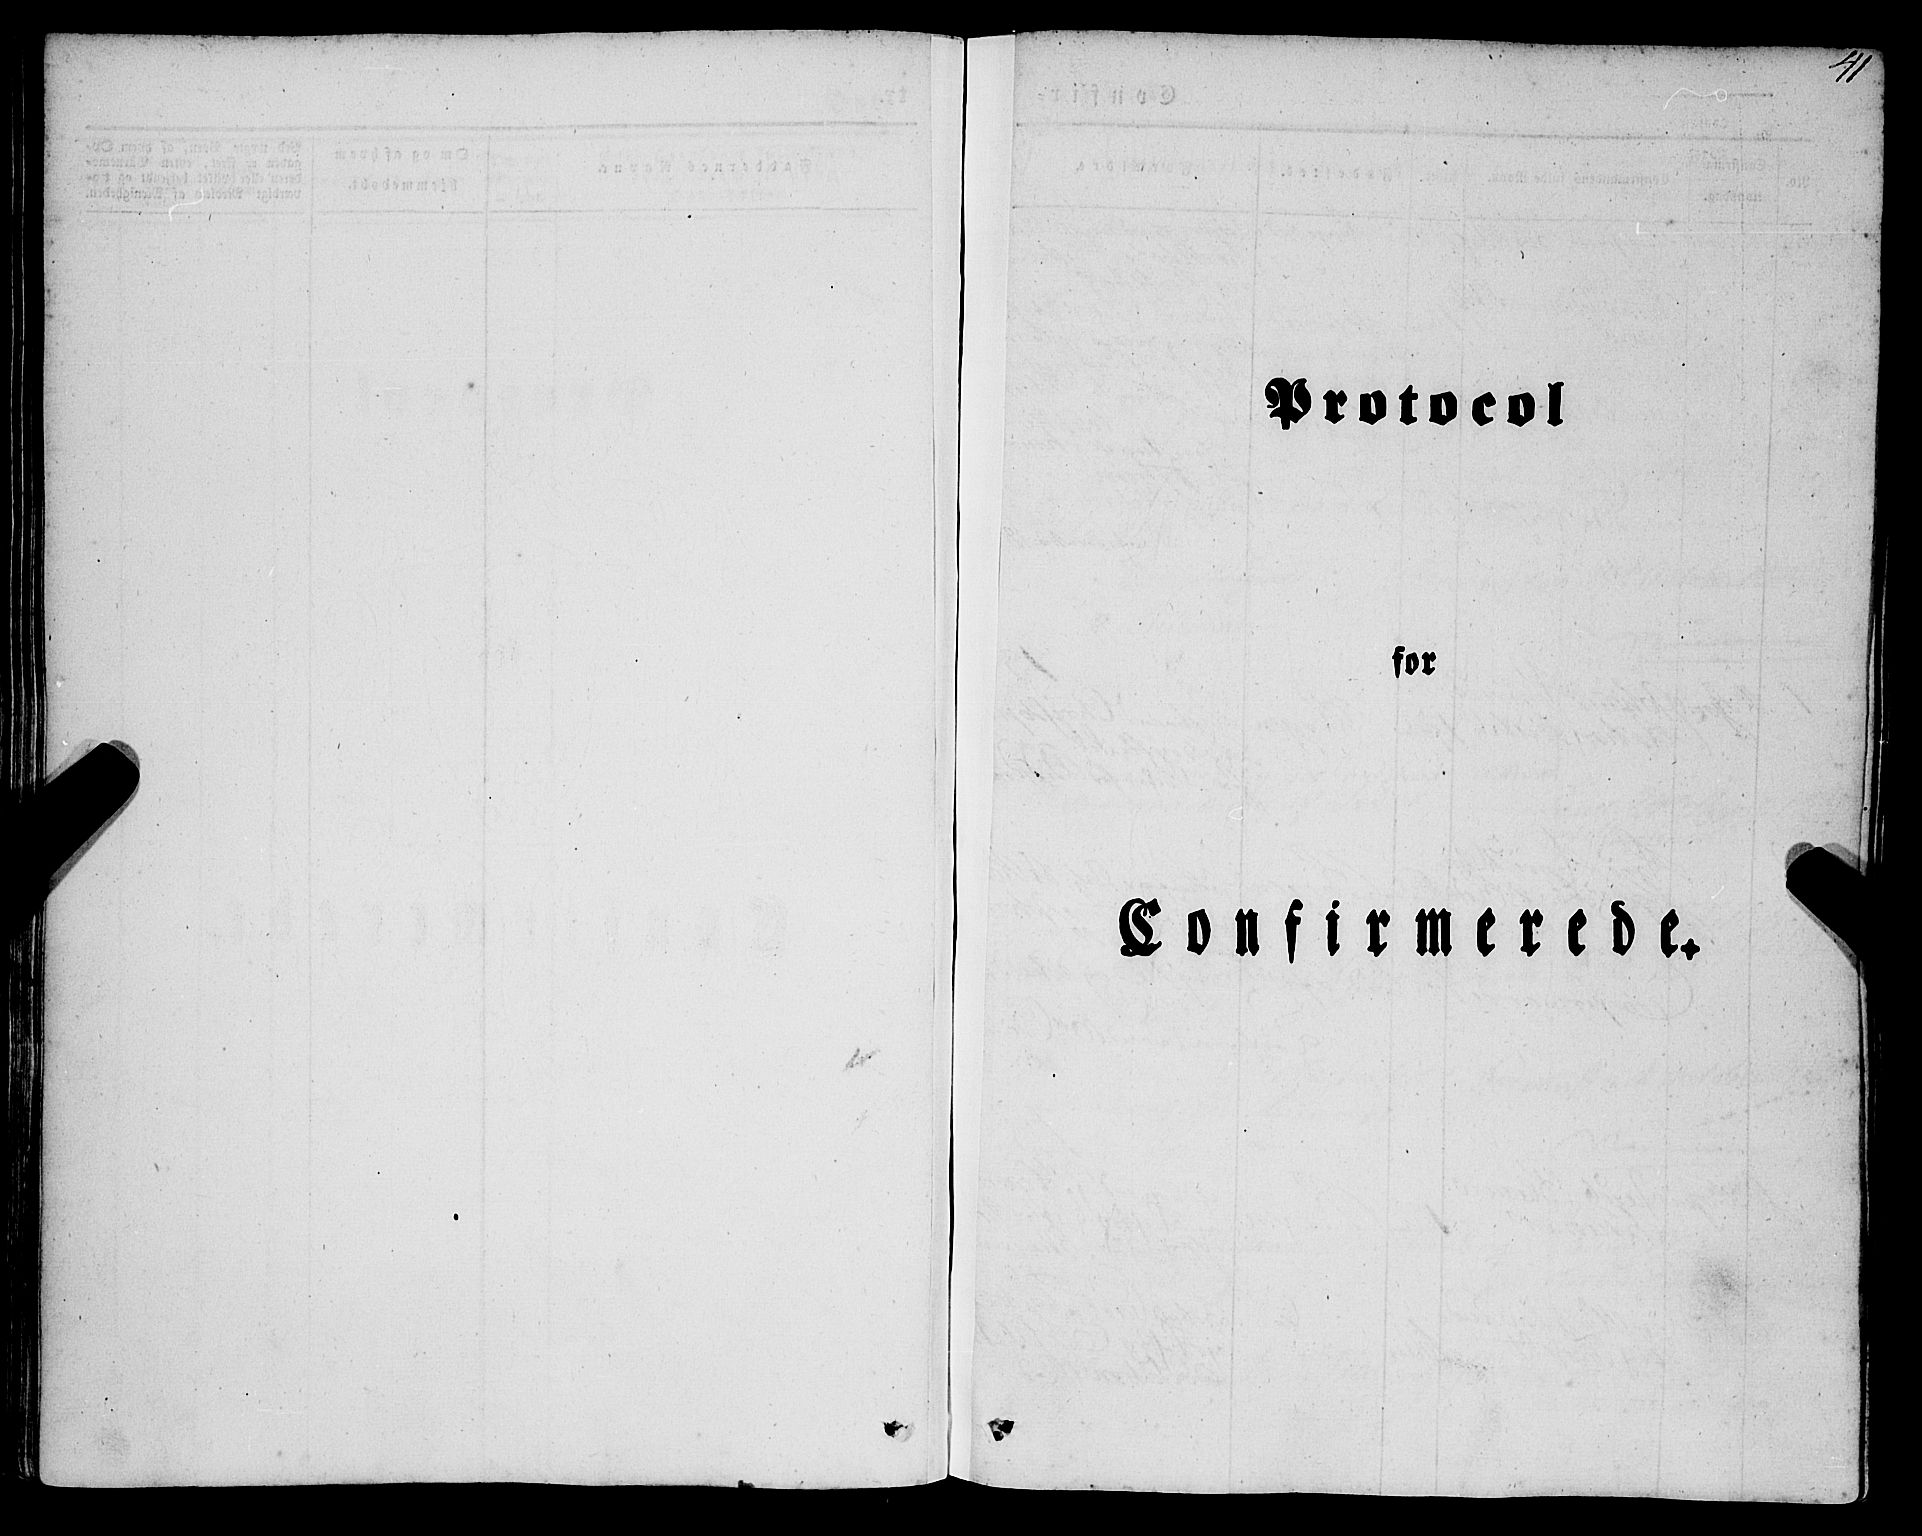 SAB, Mariakirken Sokneprestembete, H/Haa/L0006: Ministerialbok nr. A 6, 1846-1877, s. 41